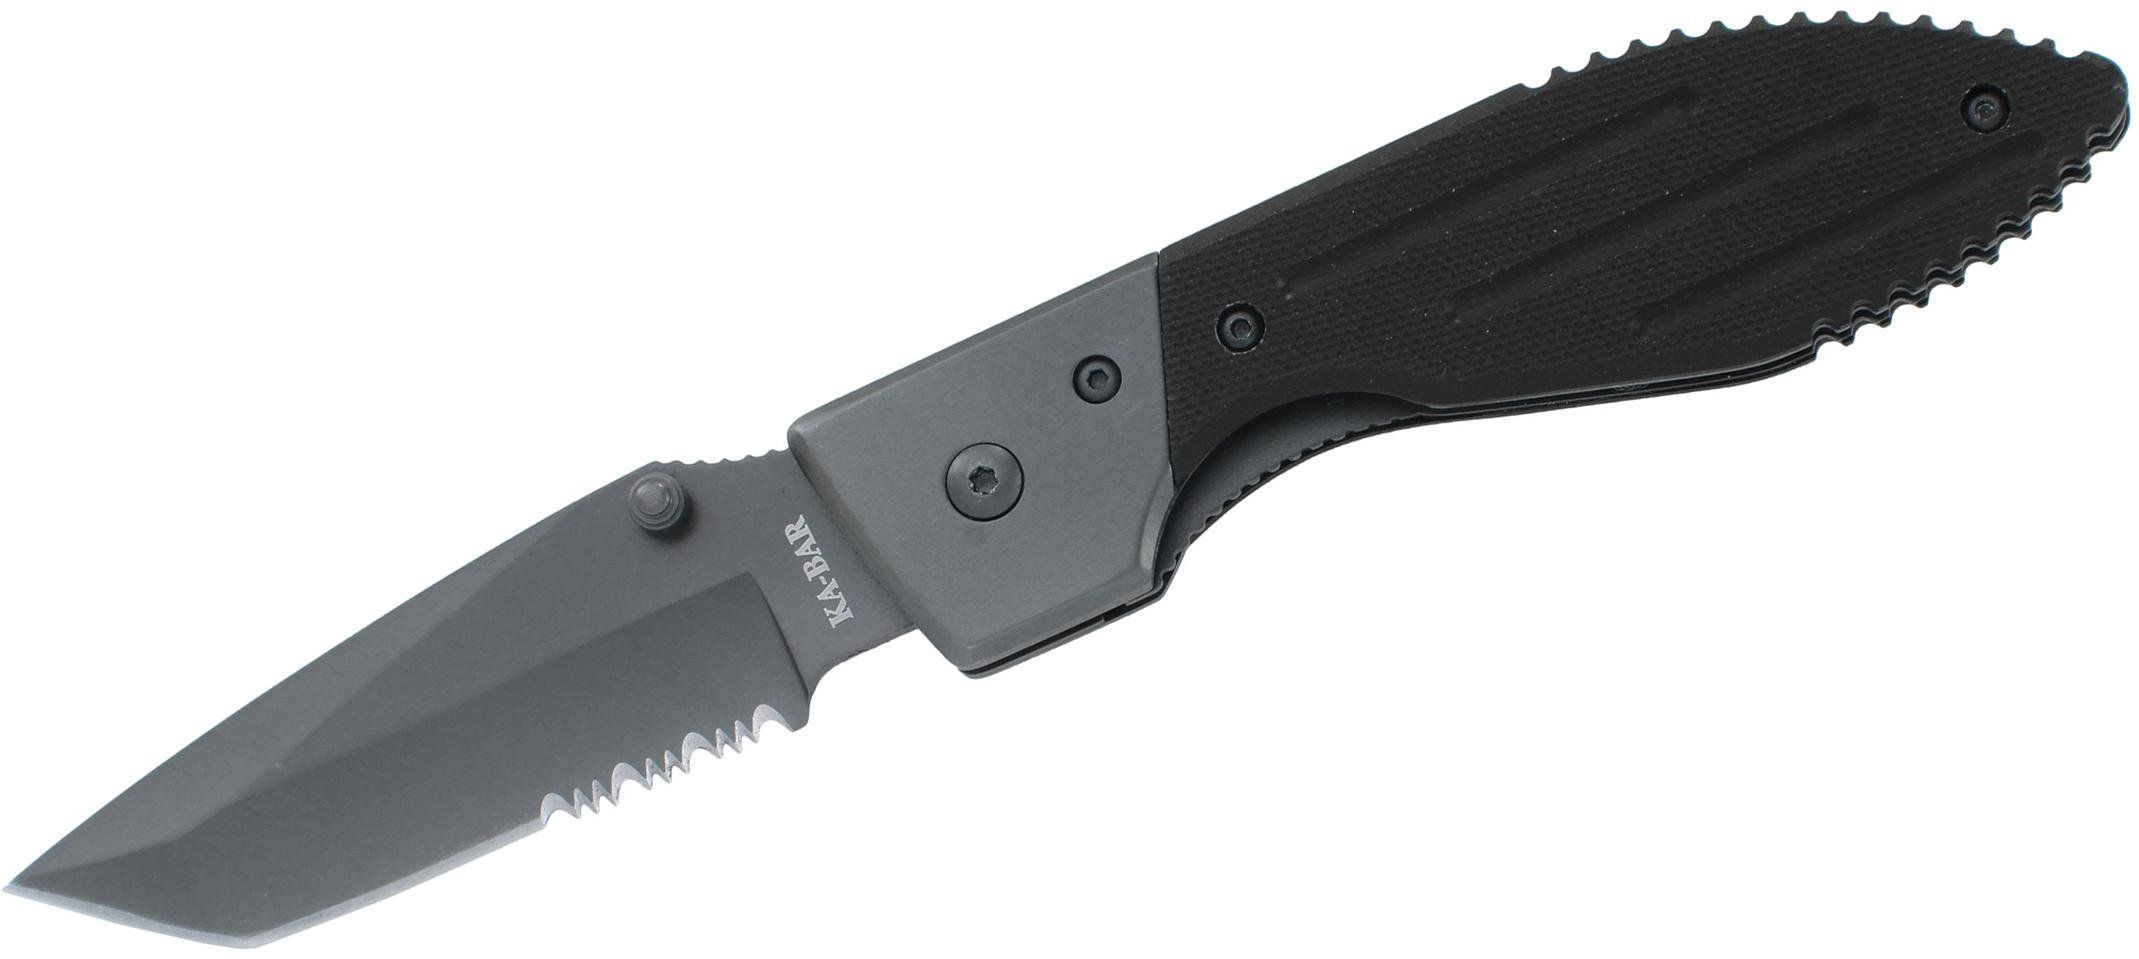 KA-BAR 3075 Warthog Folder III 3.125 inch Tanto Combo Blade, Black G10 Handles